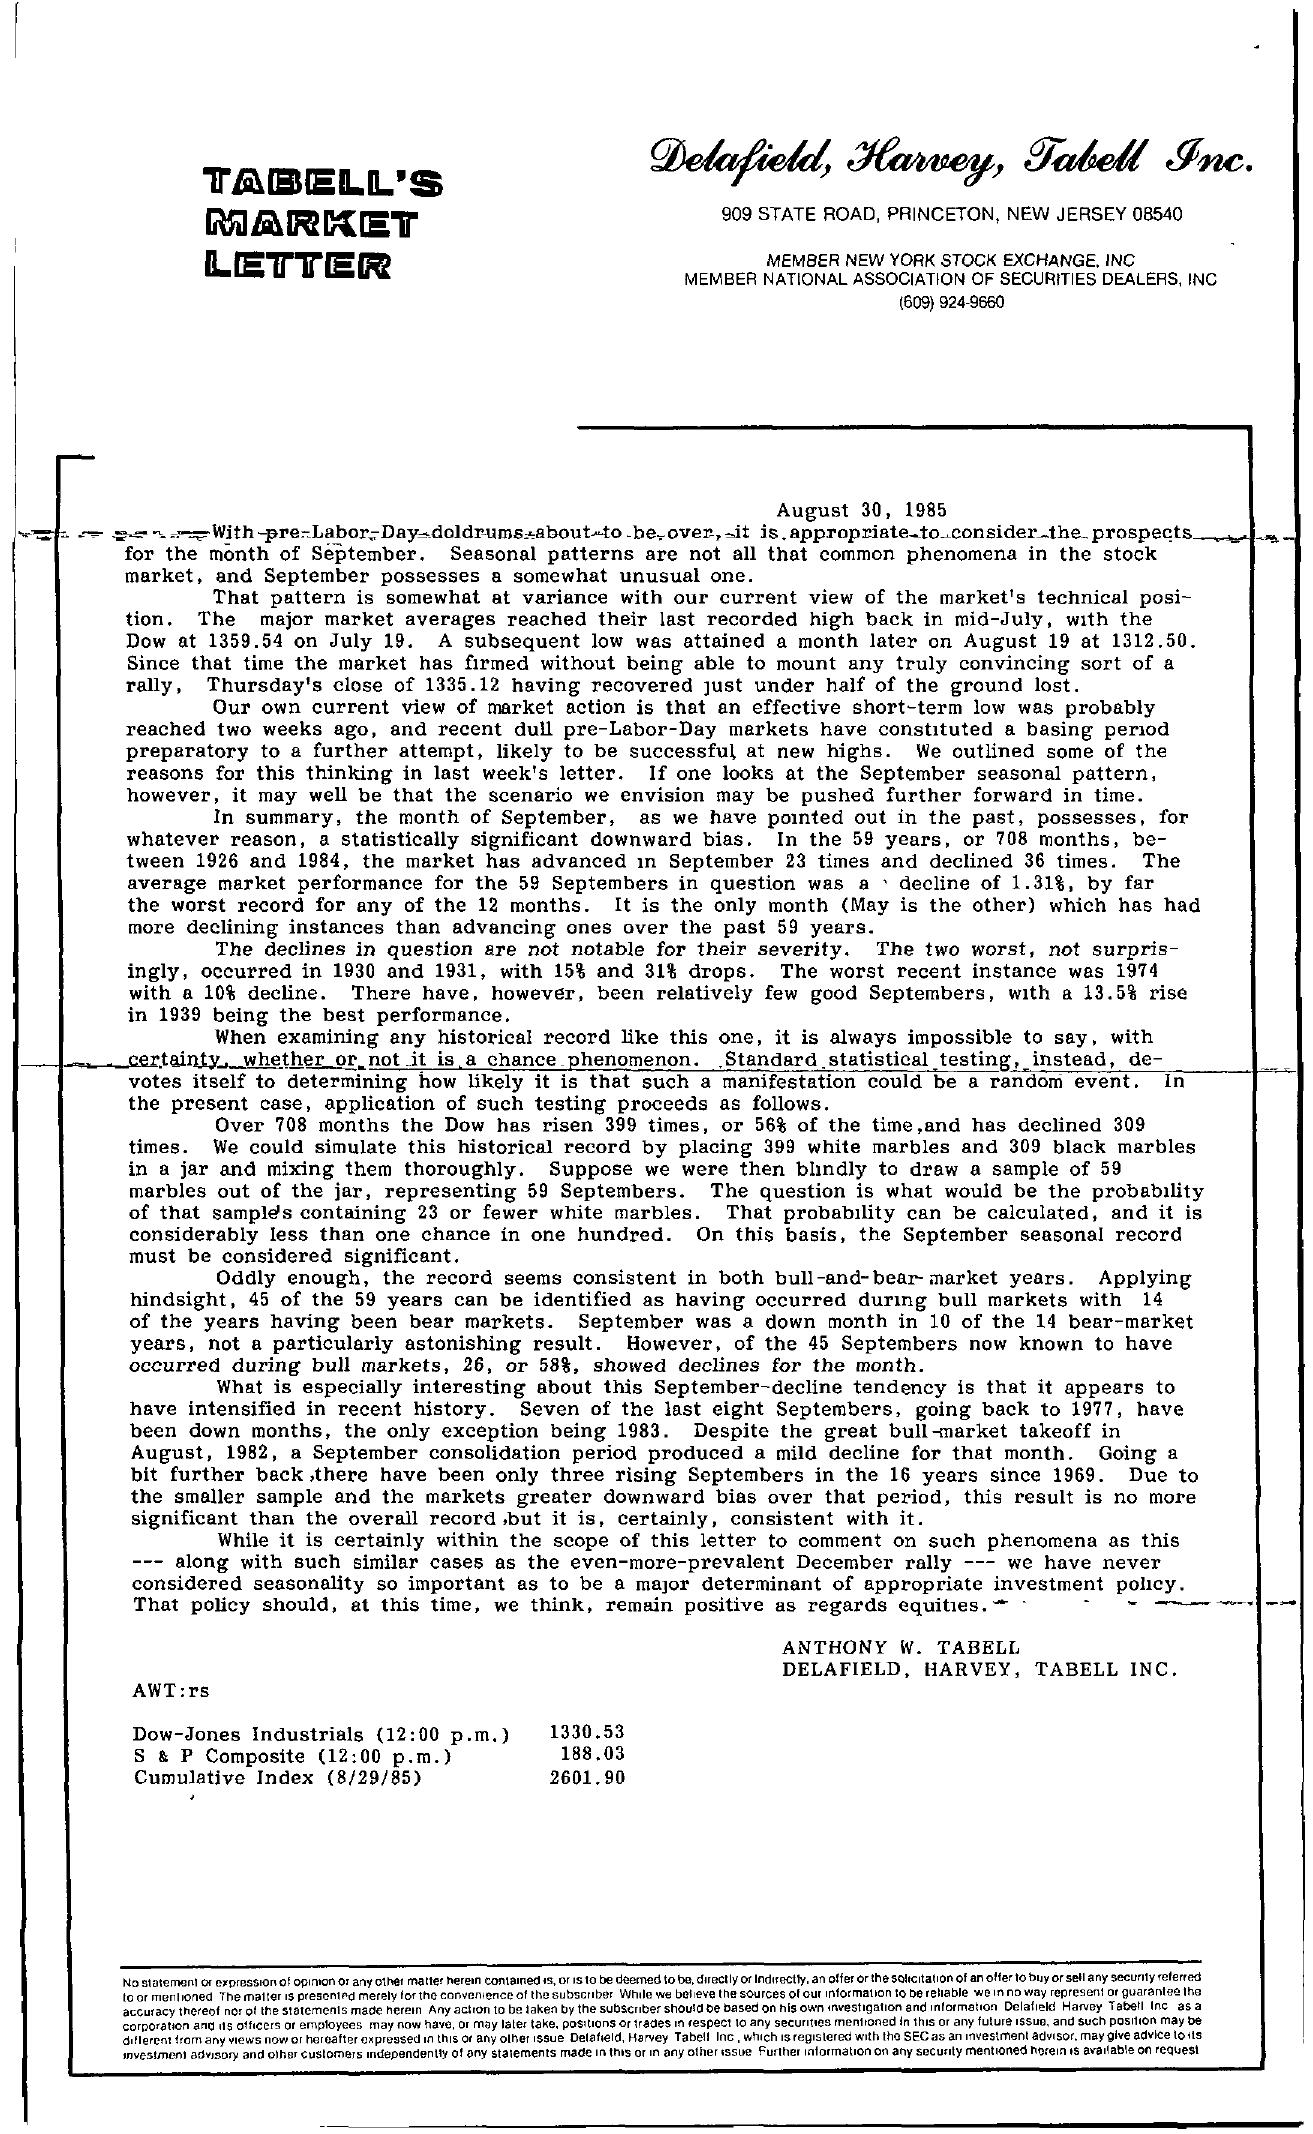 Tabell's Market Letter - August 30, 1985